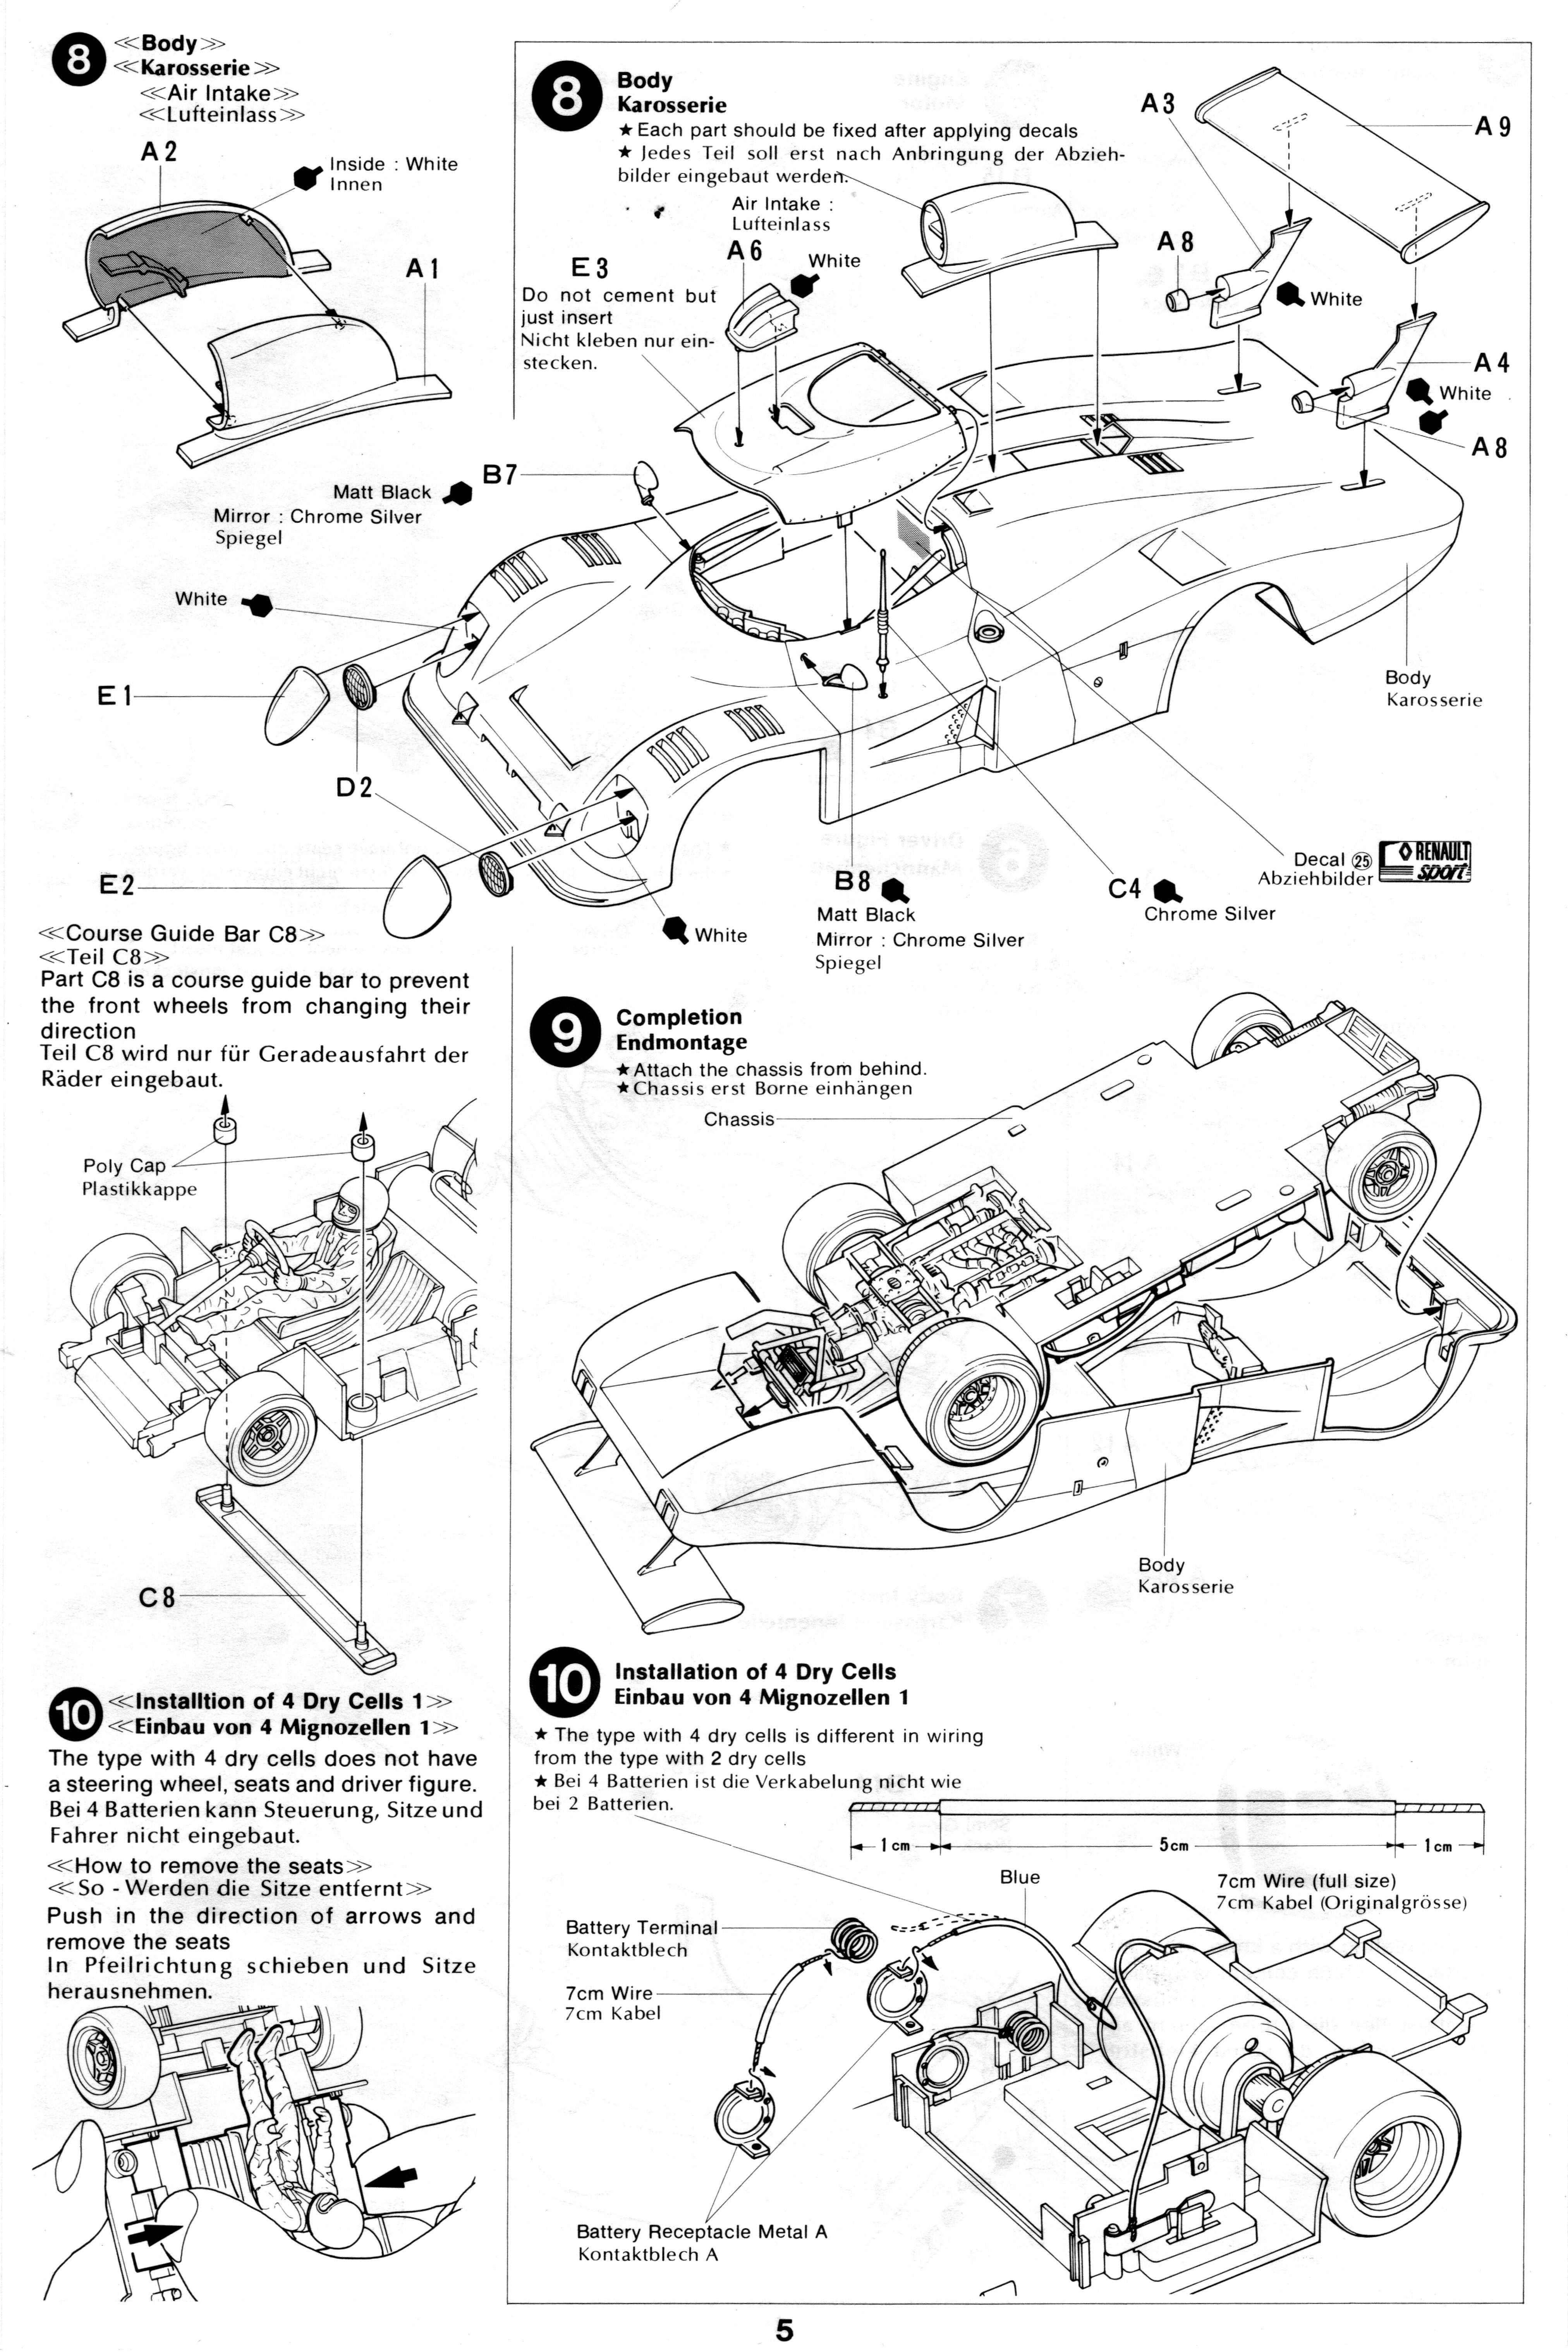 Pin By Gluefinger On Tamiya 1 24 Renault Alpine A442b Turbo Renault Alpine White Bodies How To Apply